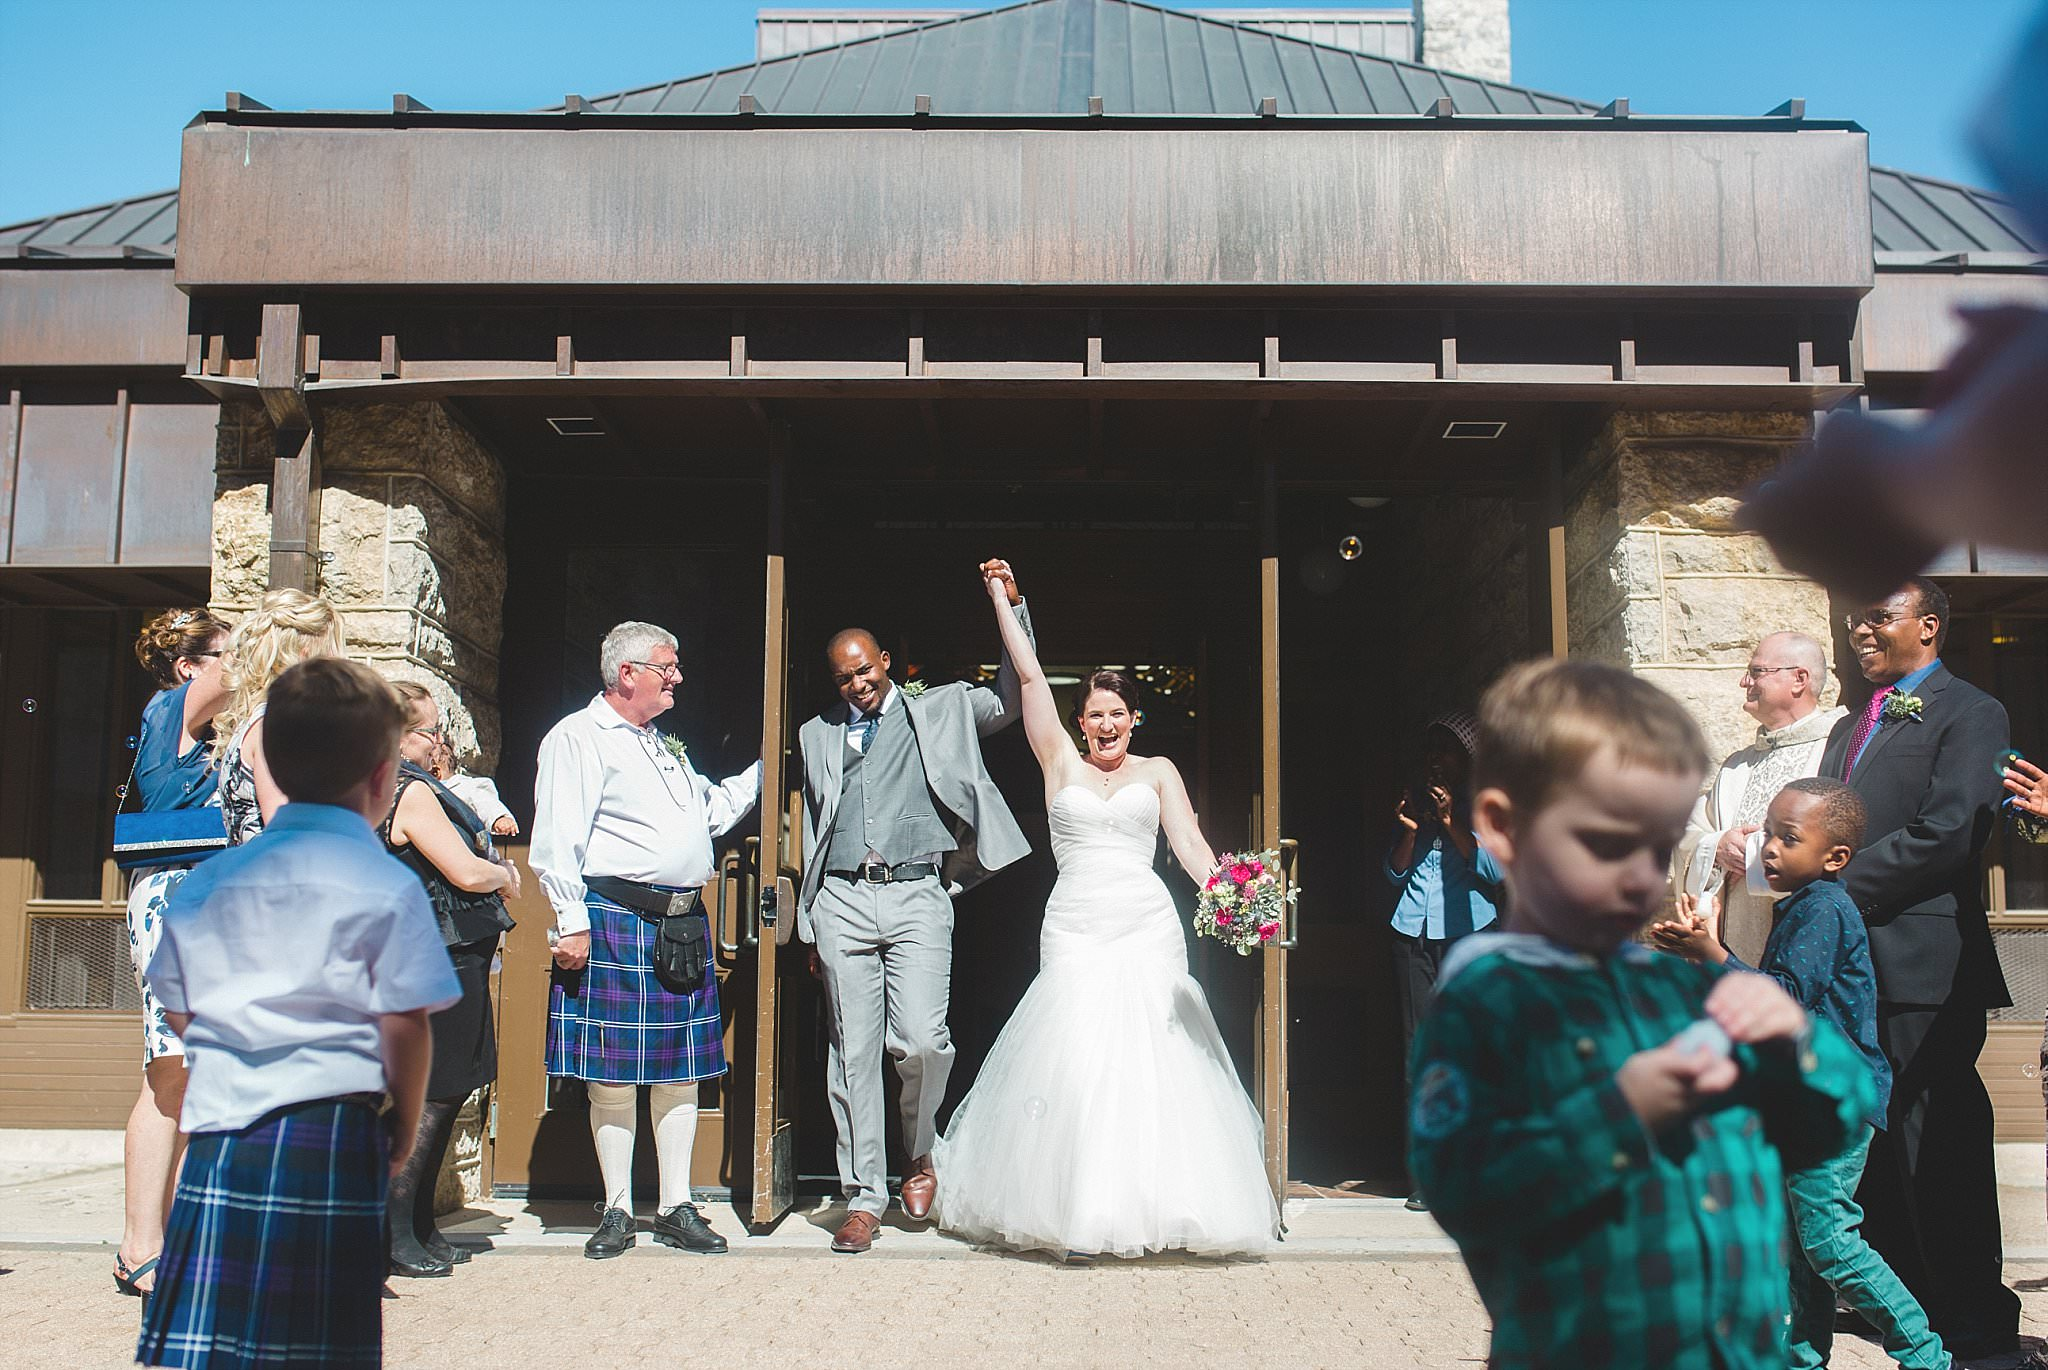 Destination wedding Photographer,The Gibsons,canadian city wedding,natural wedding photographers,wedding fort garry hotel winnipeg,wedding fort gibraltar winnipeg,wedding photographer canada,wedding photographers Winnipeg,winnipeg wedding photographer,